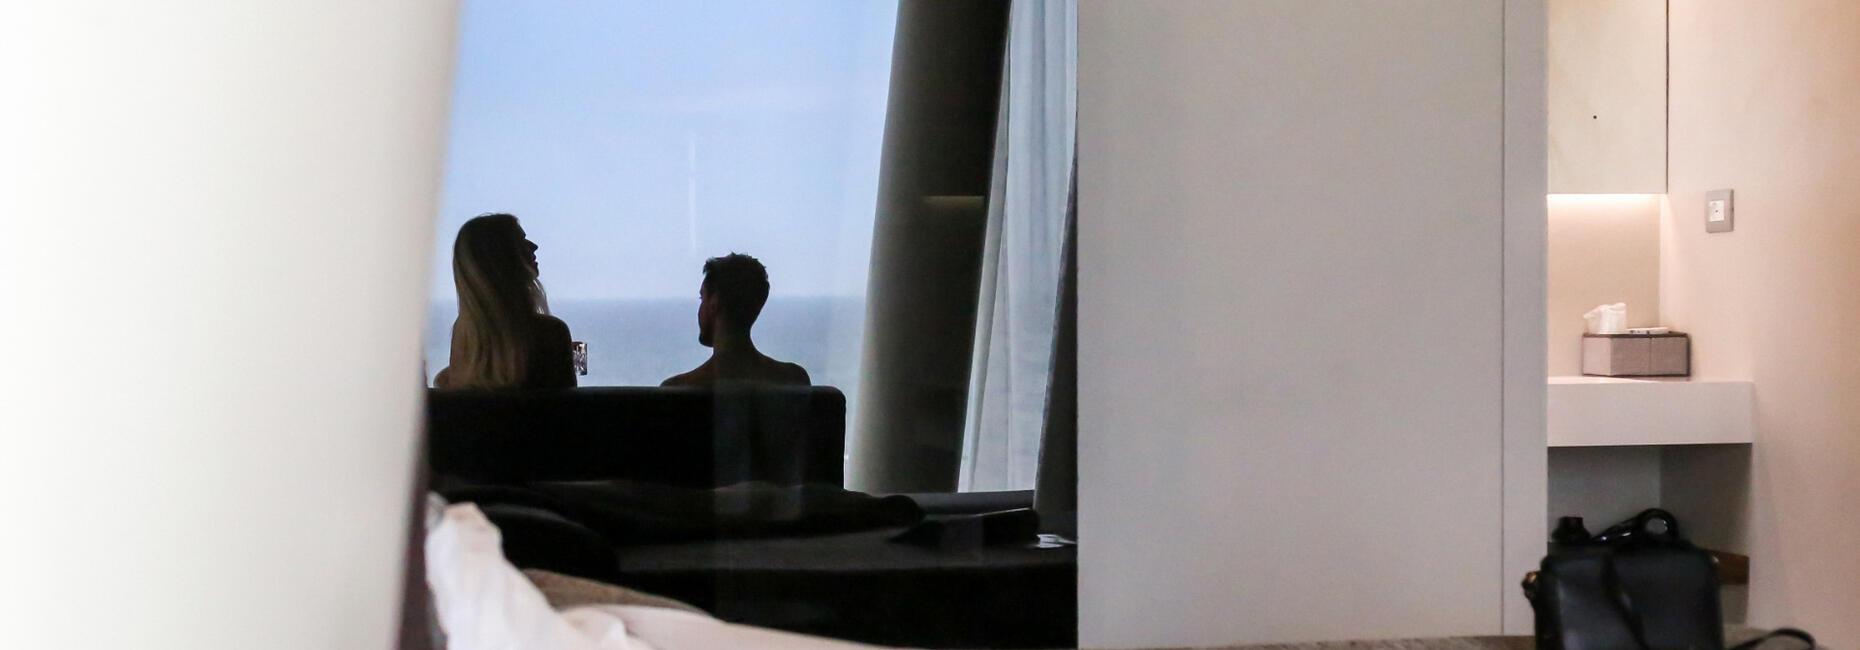 hotelcommodore fr suites-vue-mer-cervia 016